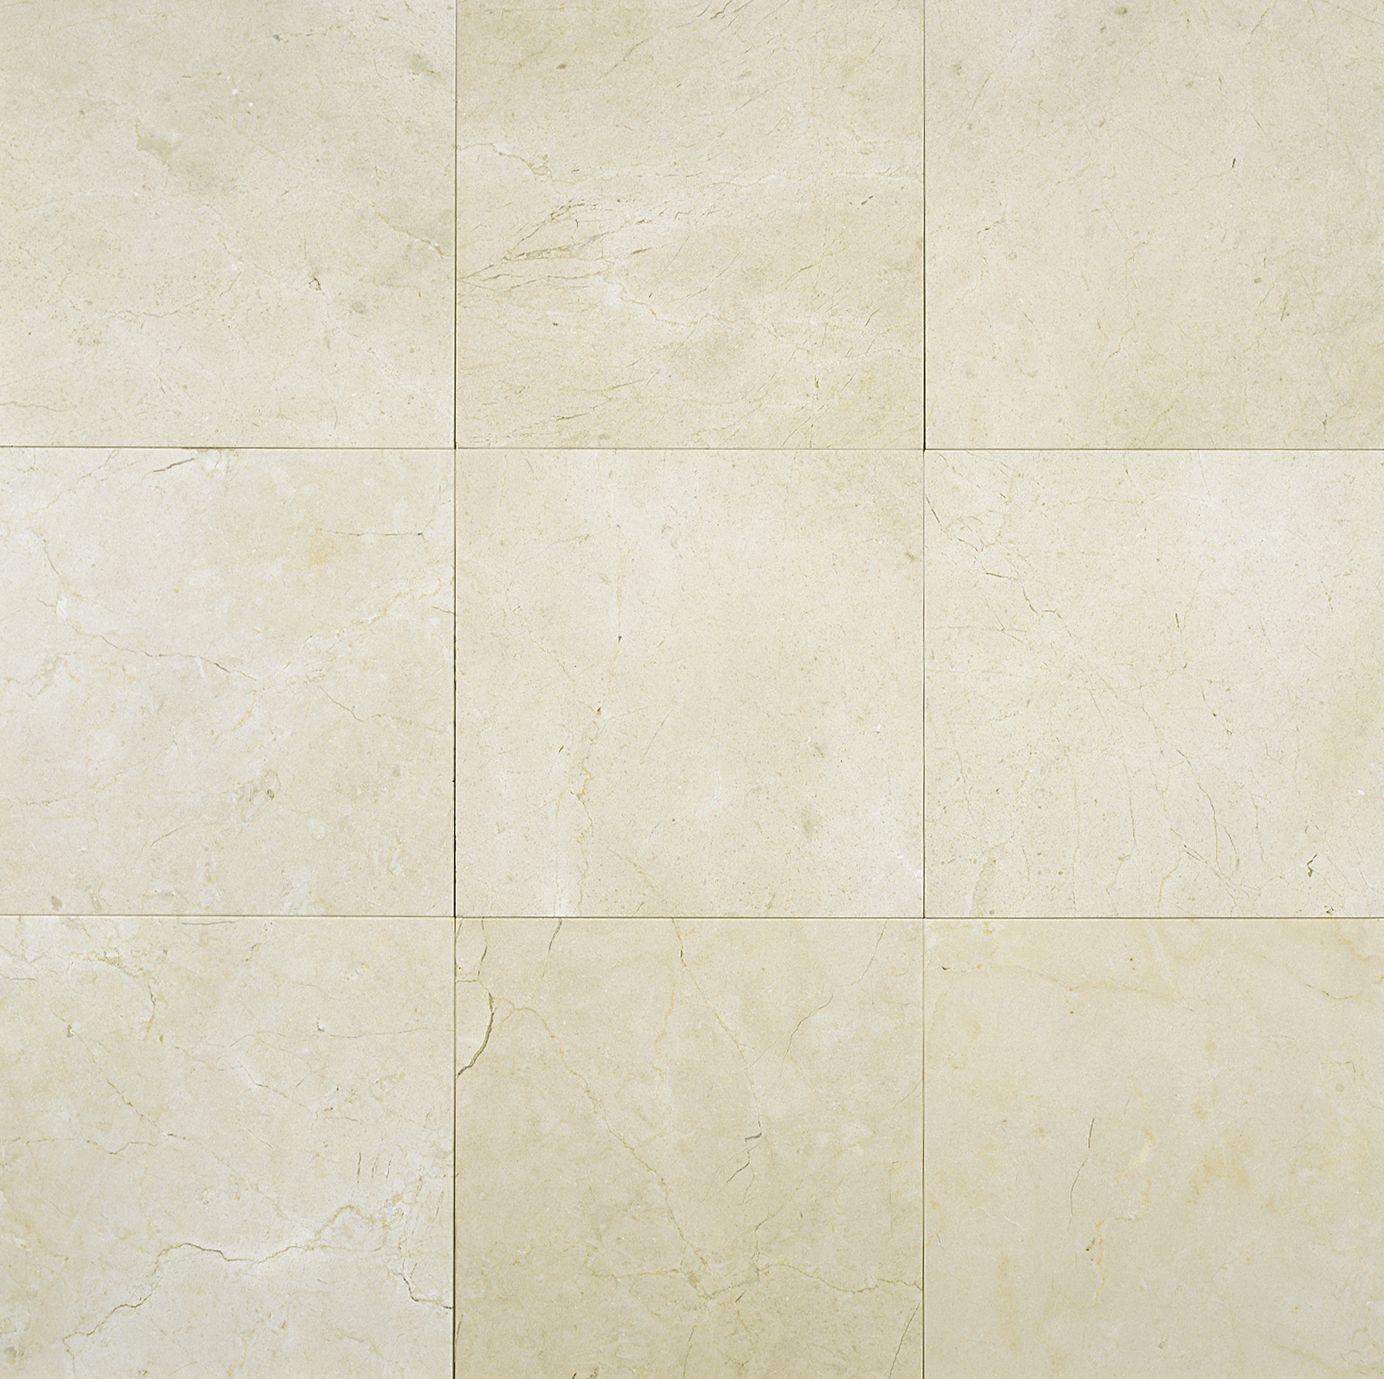 crema marfil marble 6x6 tile polished